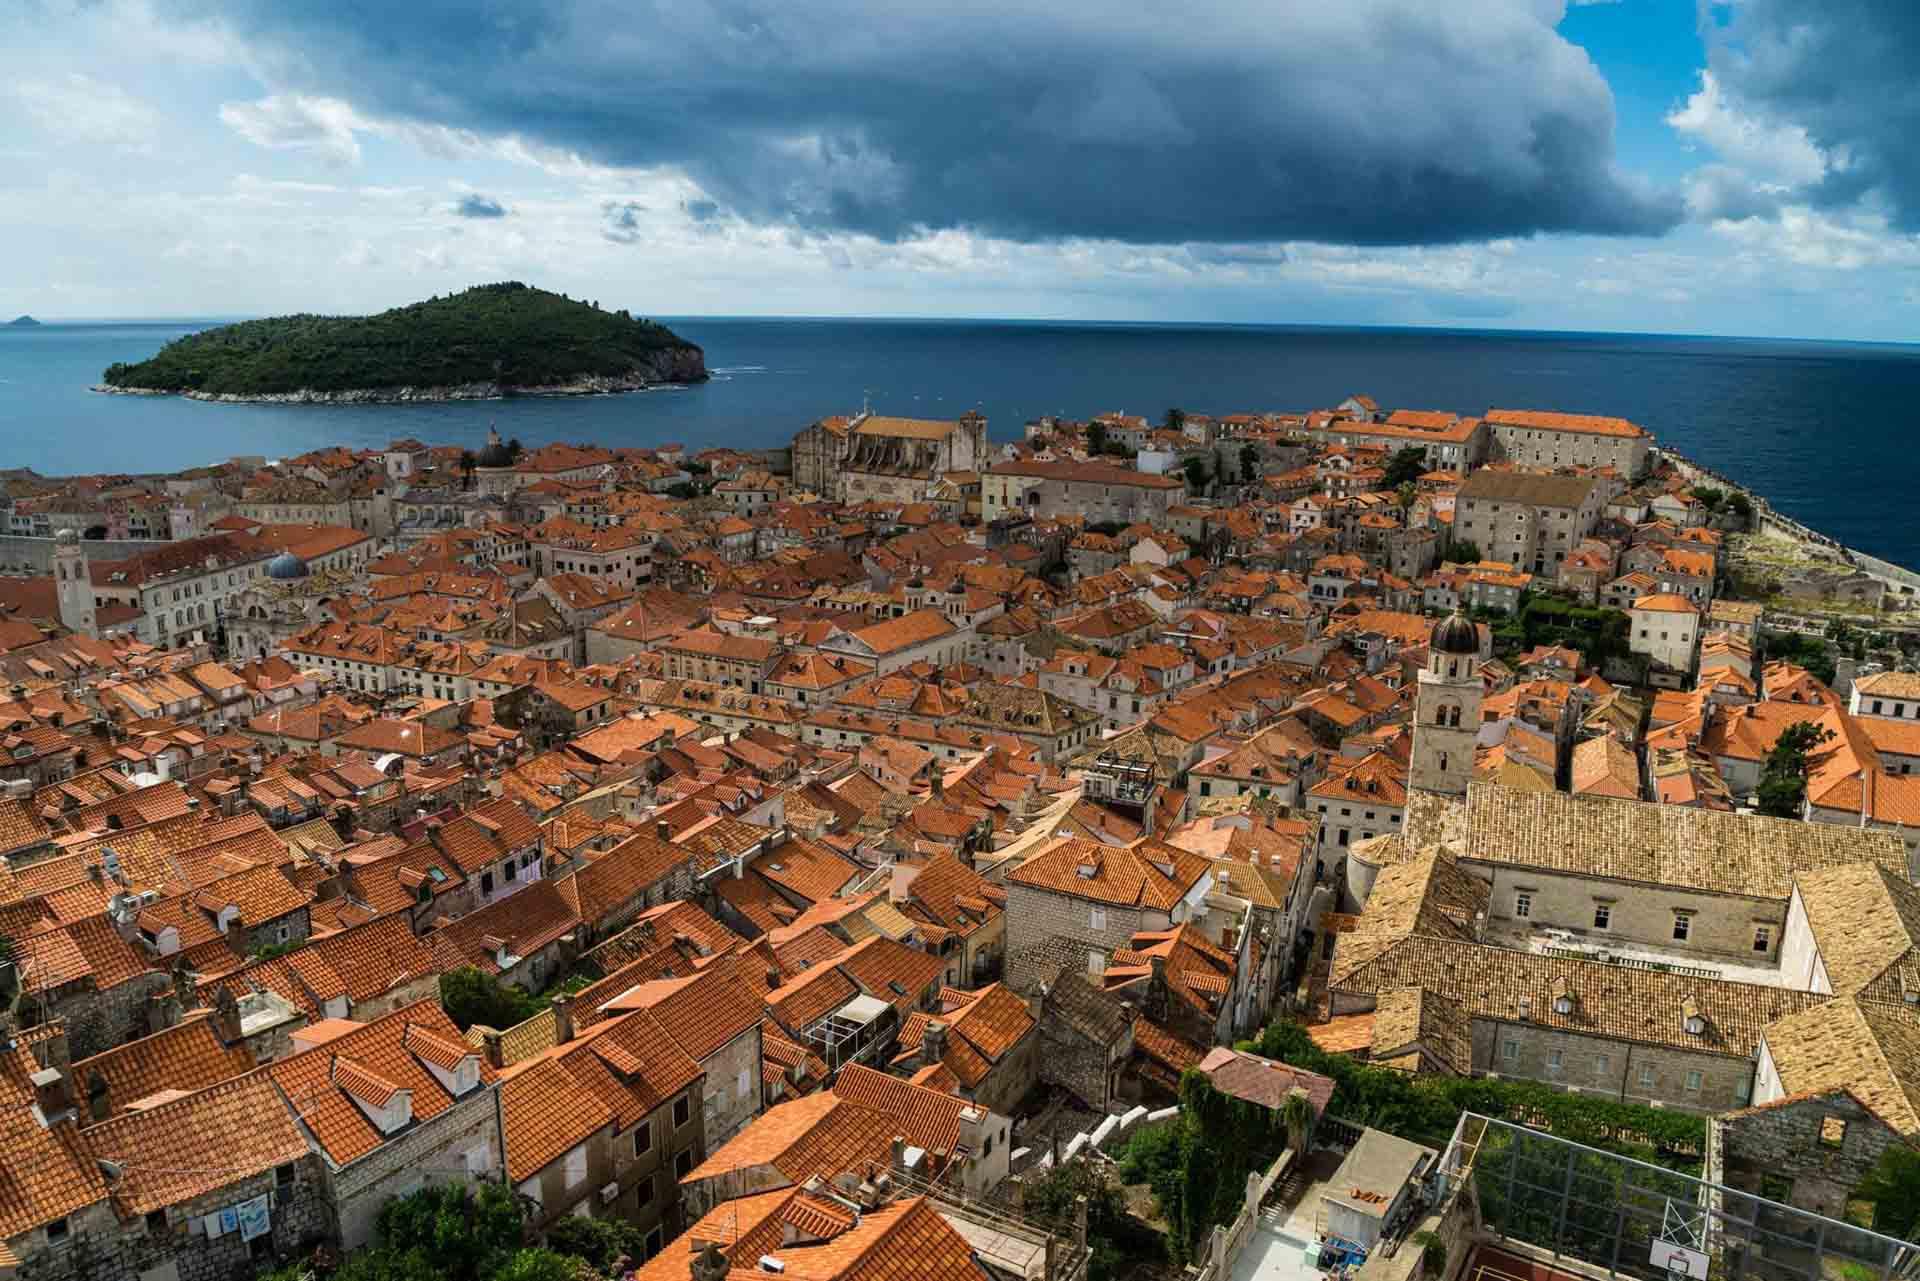 Croatia Dubrovnik City Walls tour 2, dubrovnik, croatia, pescart, photo blog, travel blog, blog, photo travel blog, enrico pescantini, pescantini